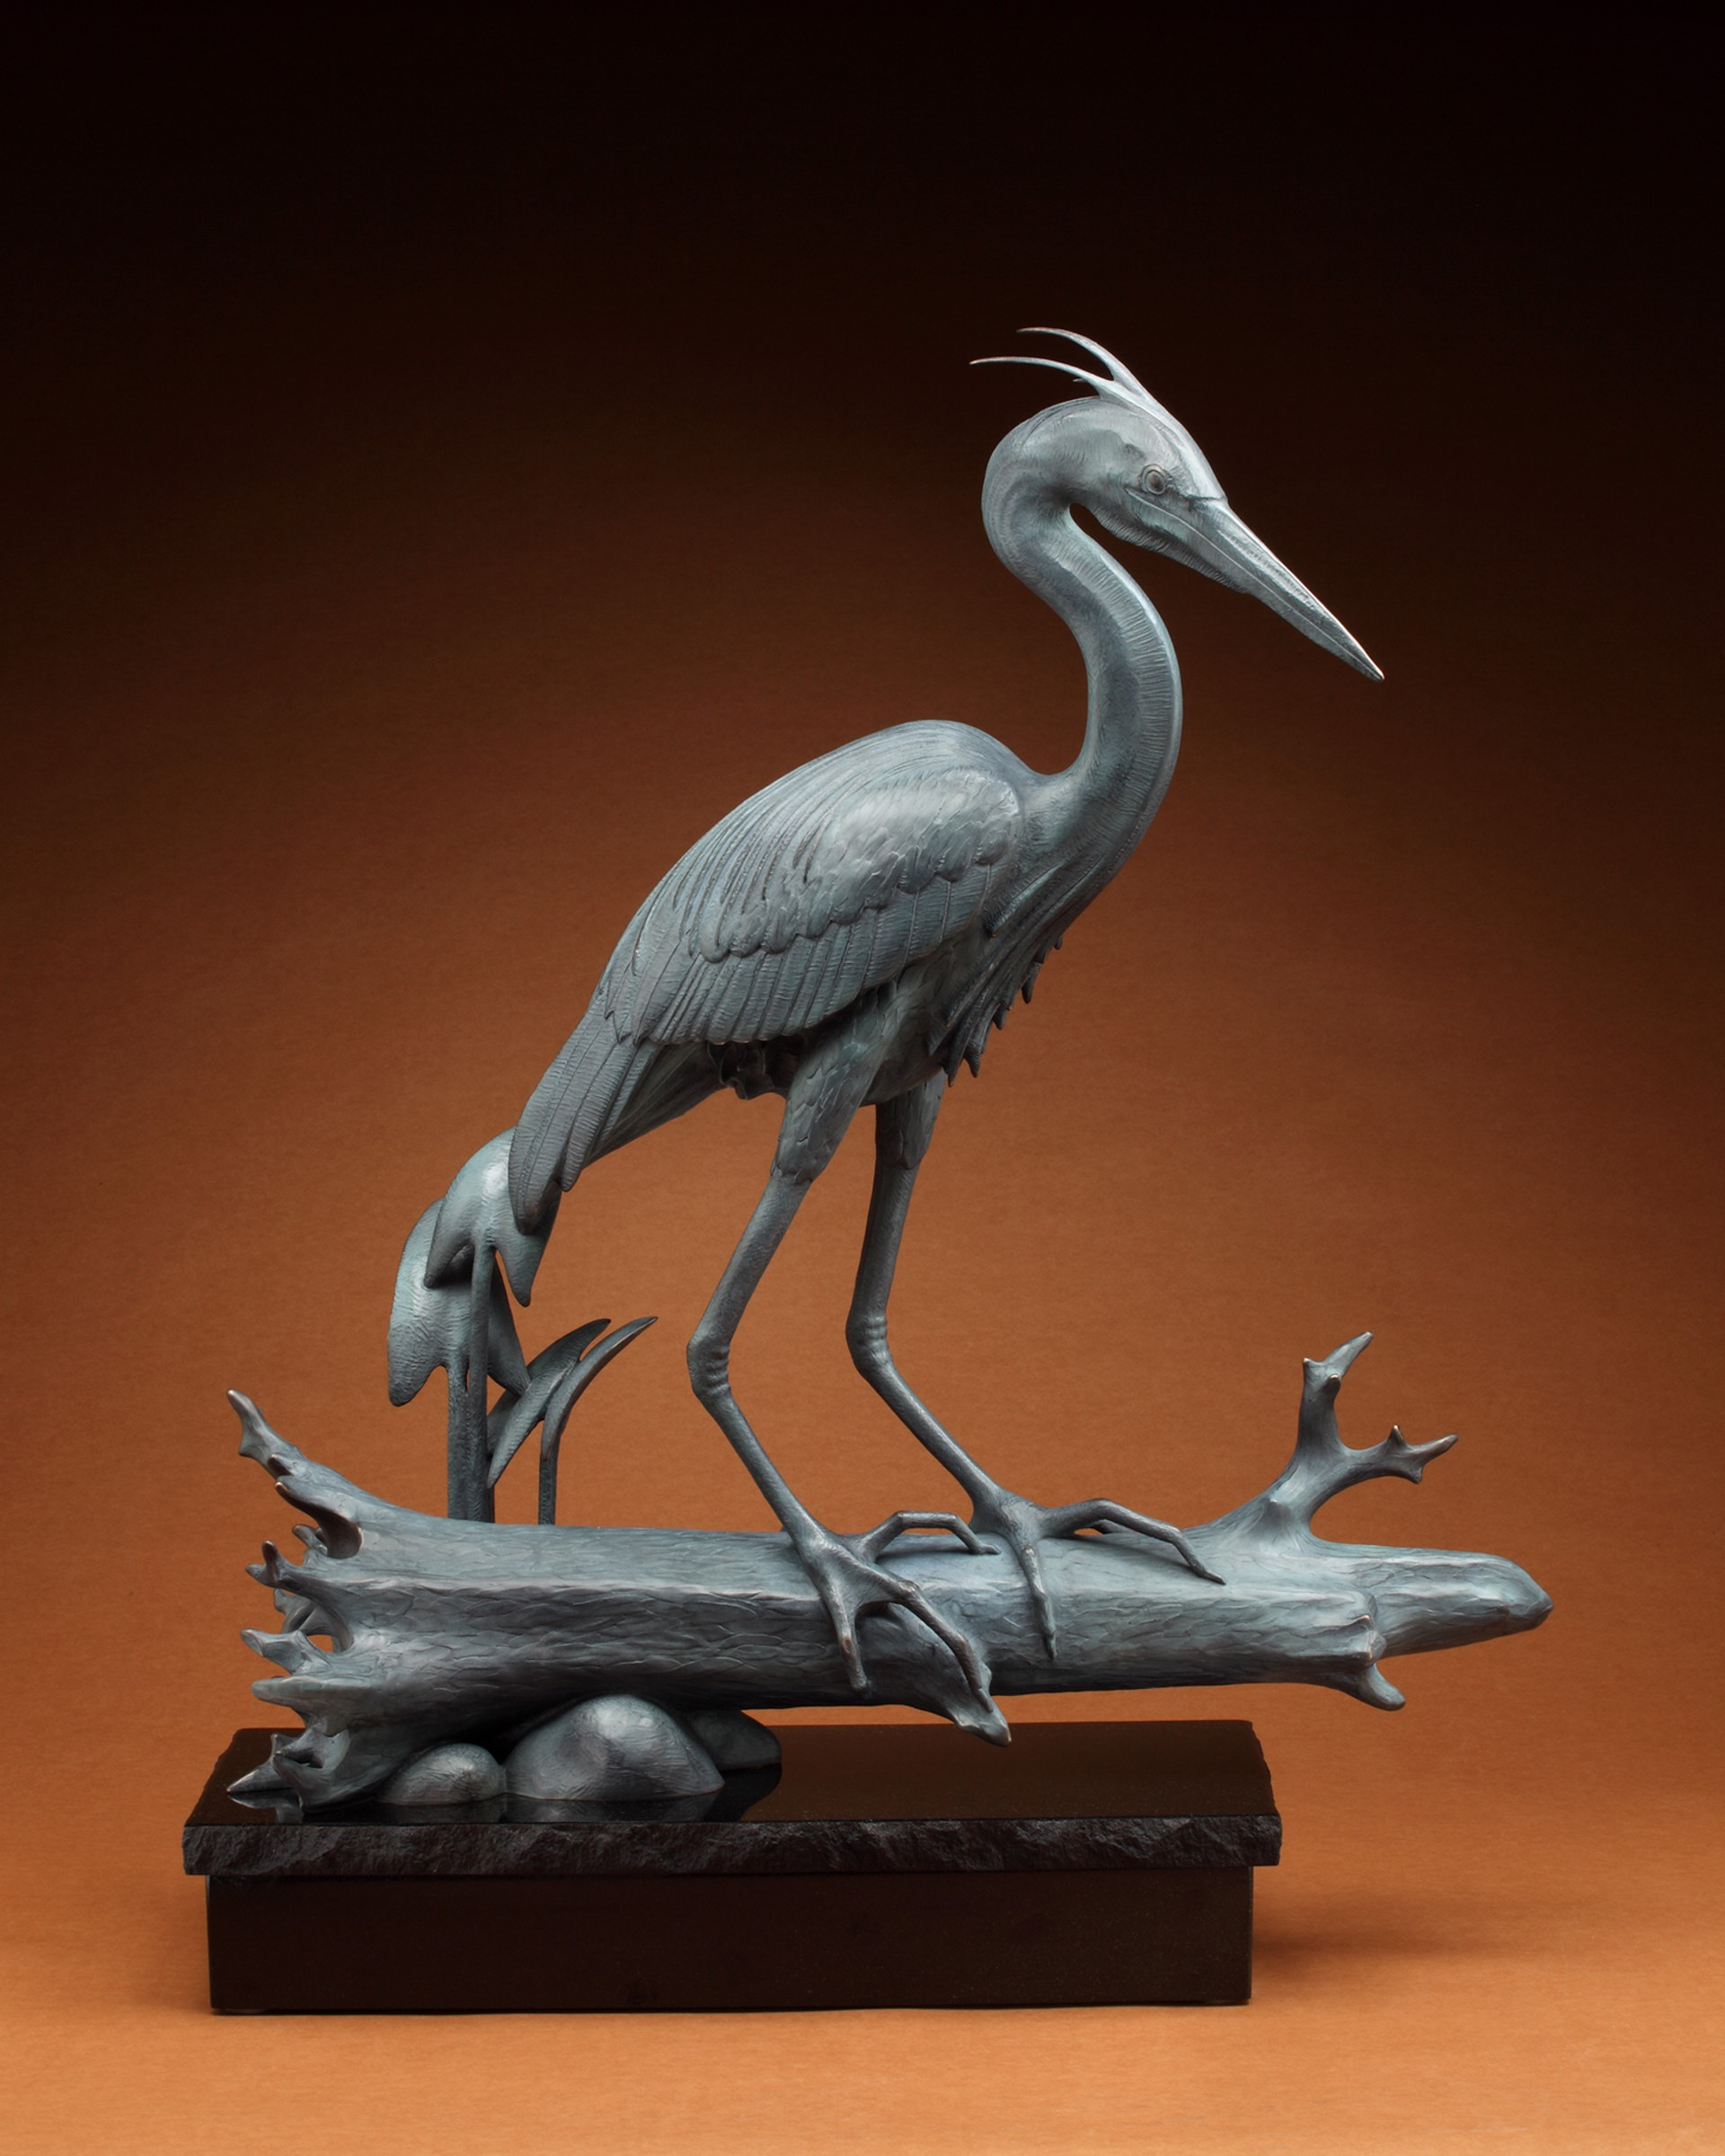 Blue Heron by Tony Hochstetler